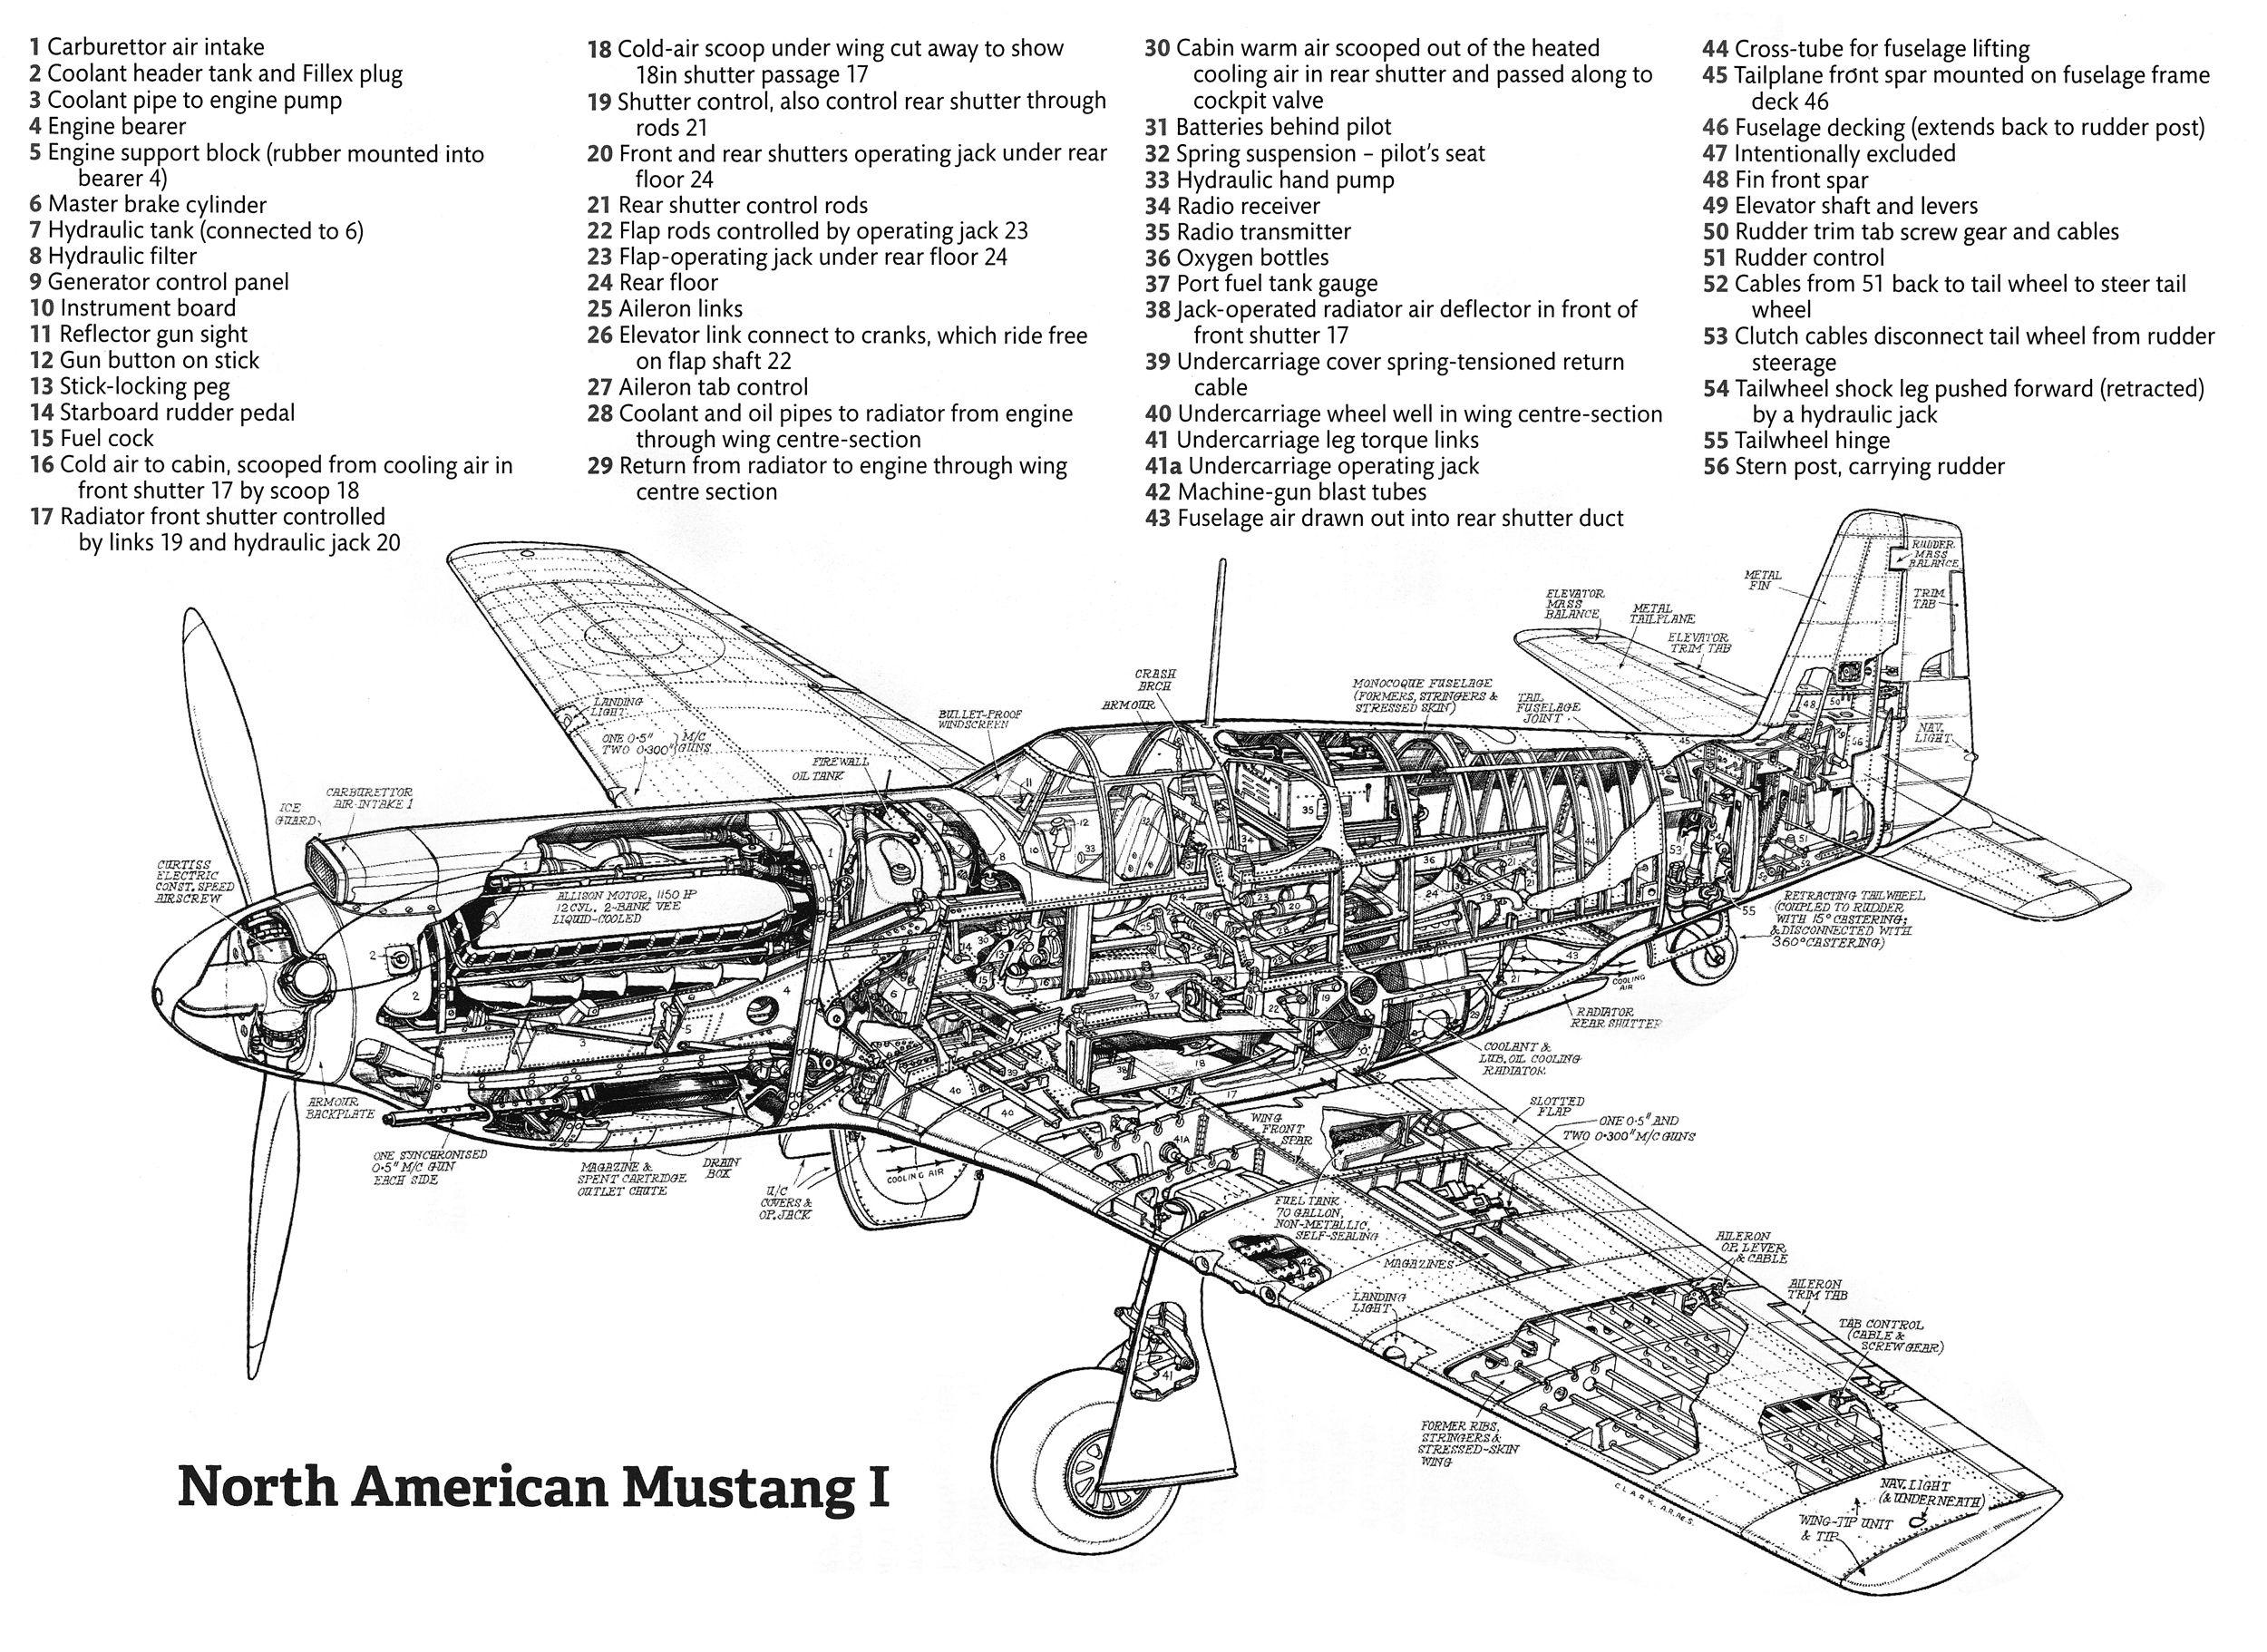 North American Mustang